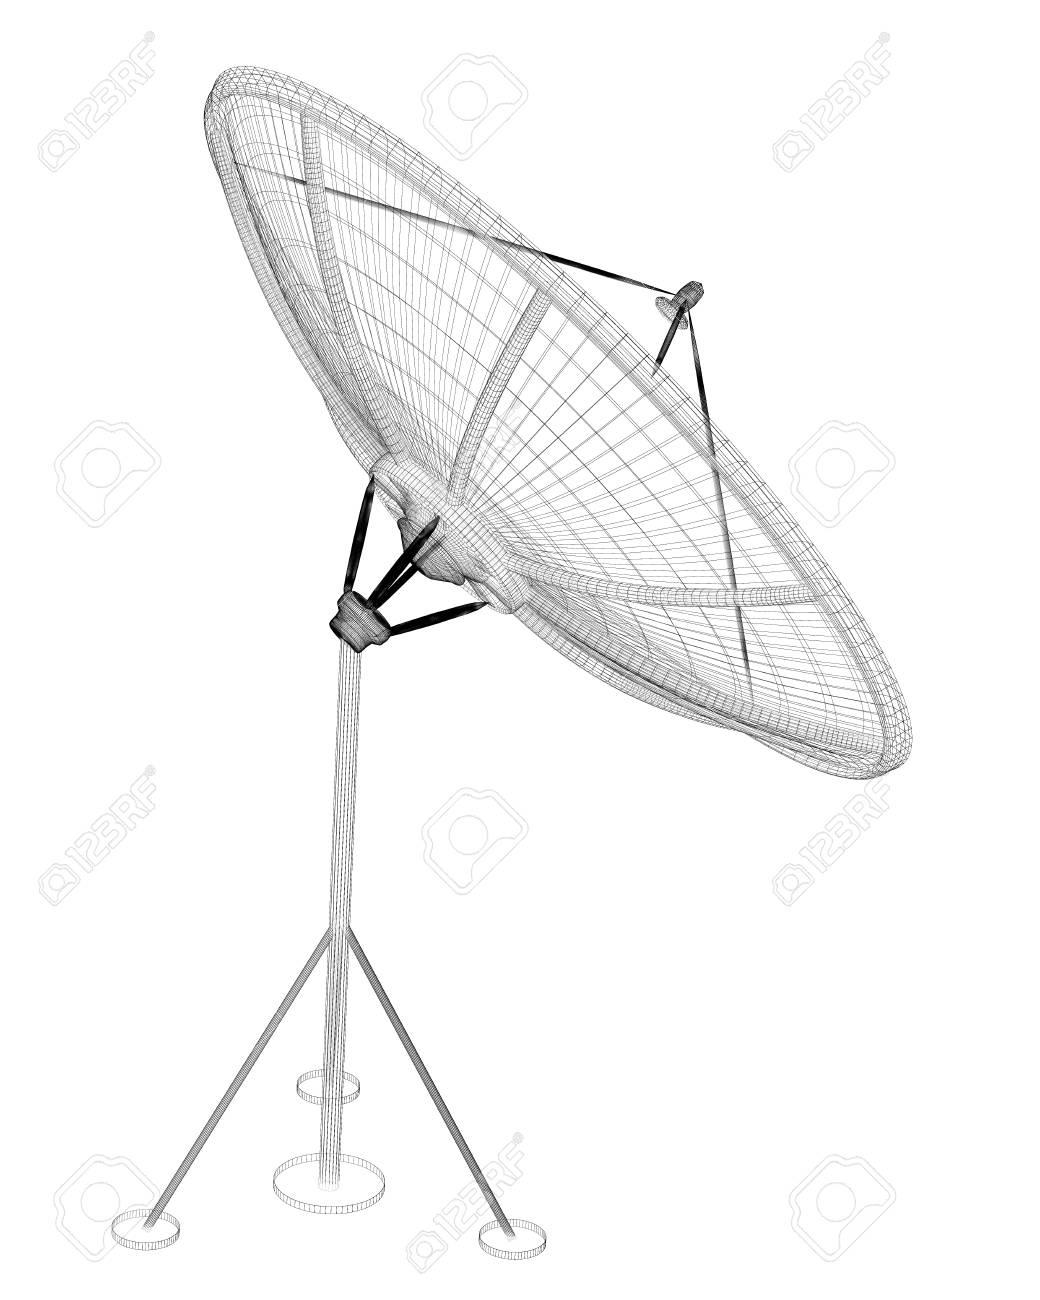 satellite tracking system satellite dish on the background stock Dish Satellite TV satellite tracking system satellite dish on the background stock photo 59883143